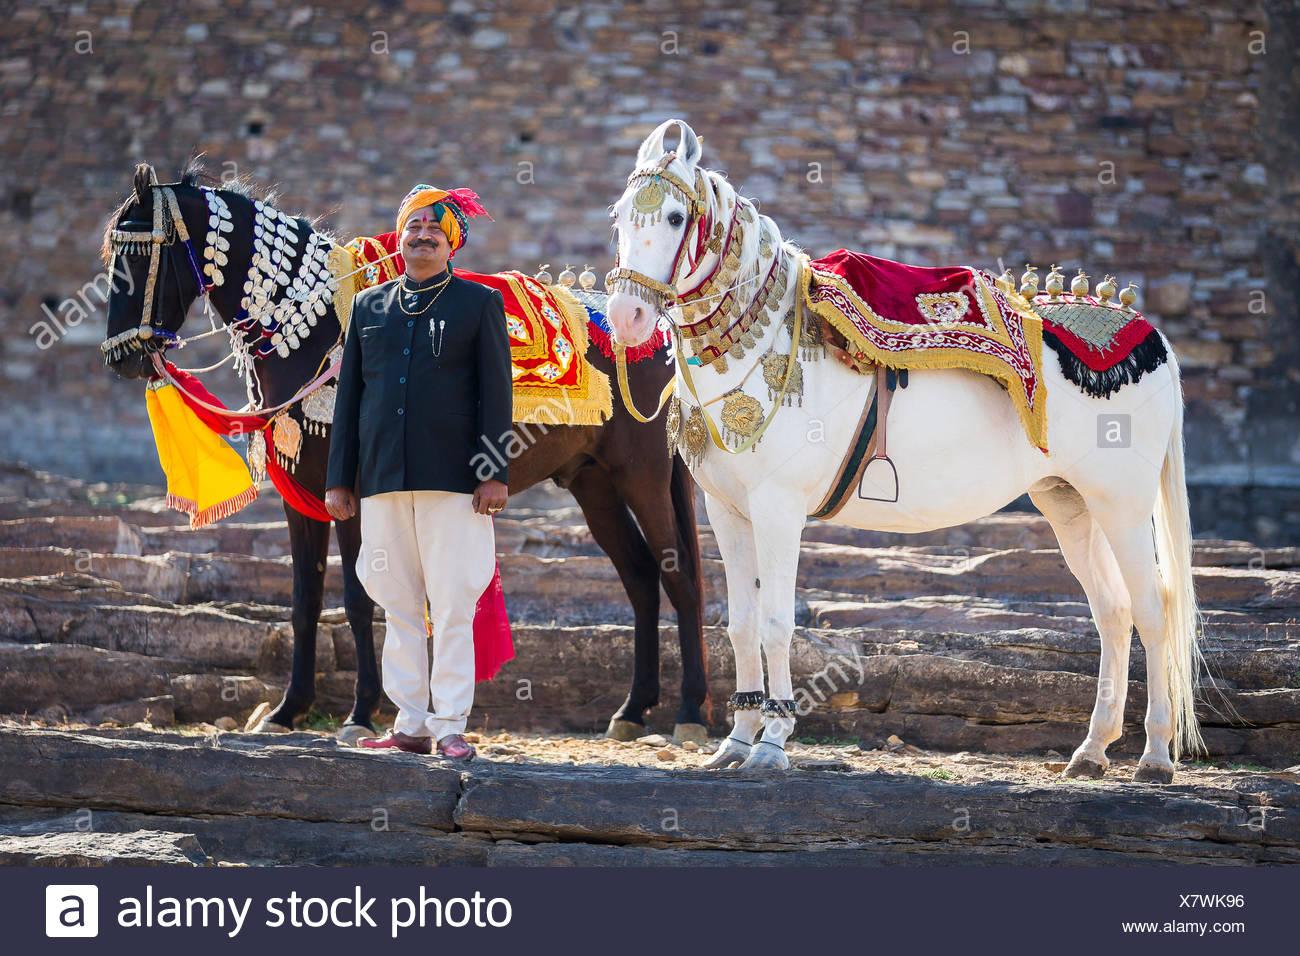 Marwari Horse. Pair of decorated dancing horses with proud owner. Rajasthan, India - Stock Image